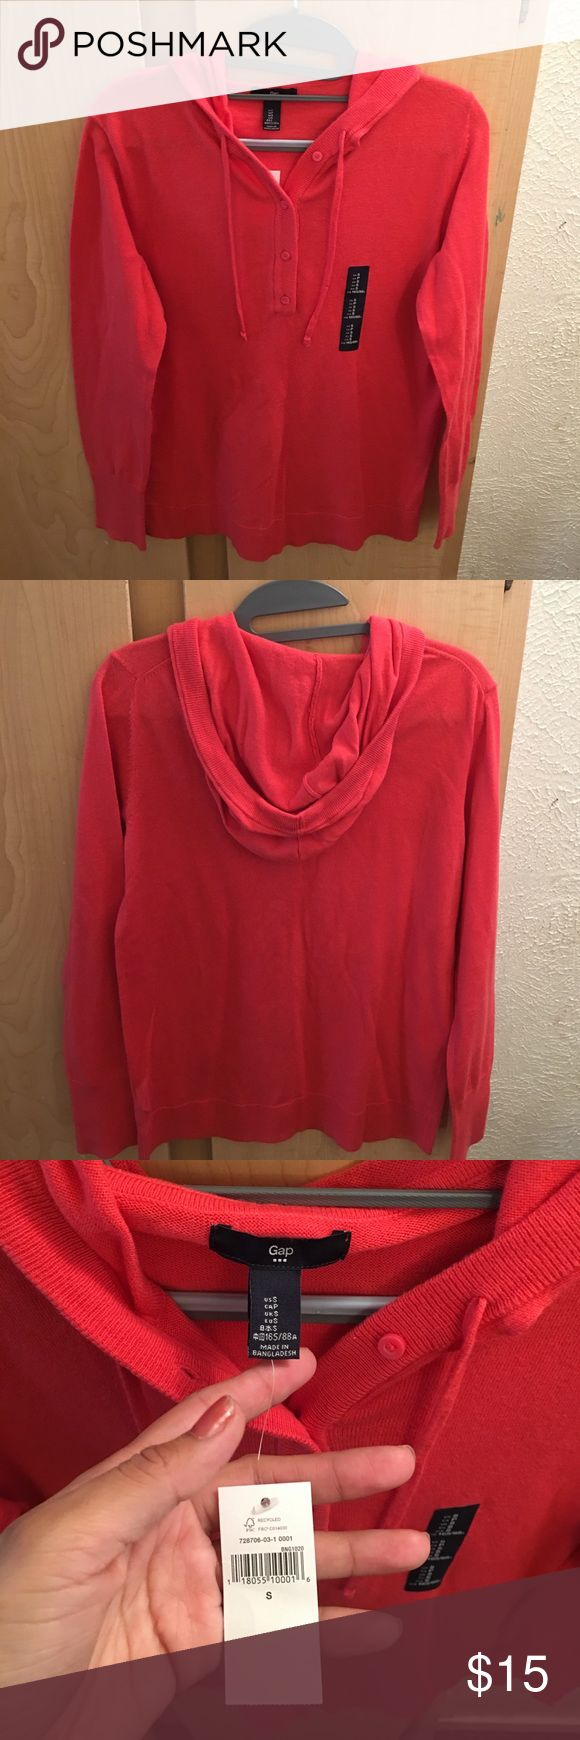 Gap sweater size small new orange color Gap sweater size small orange color new GAP Sweaters